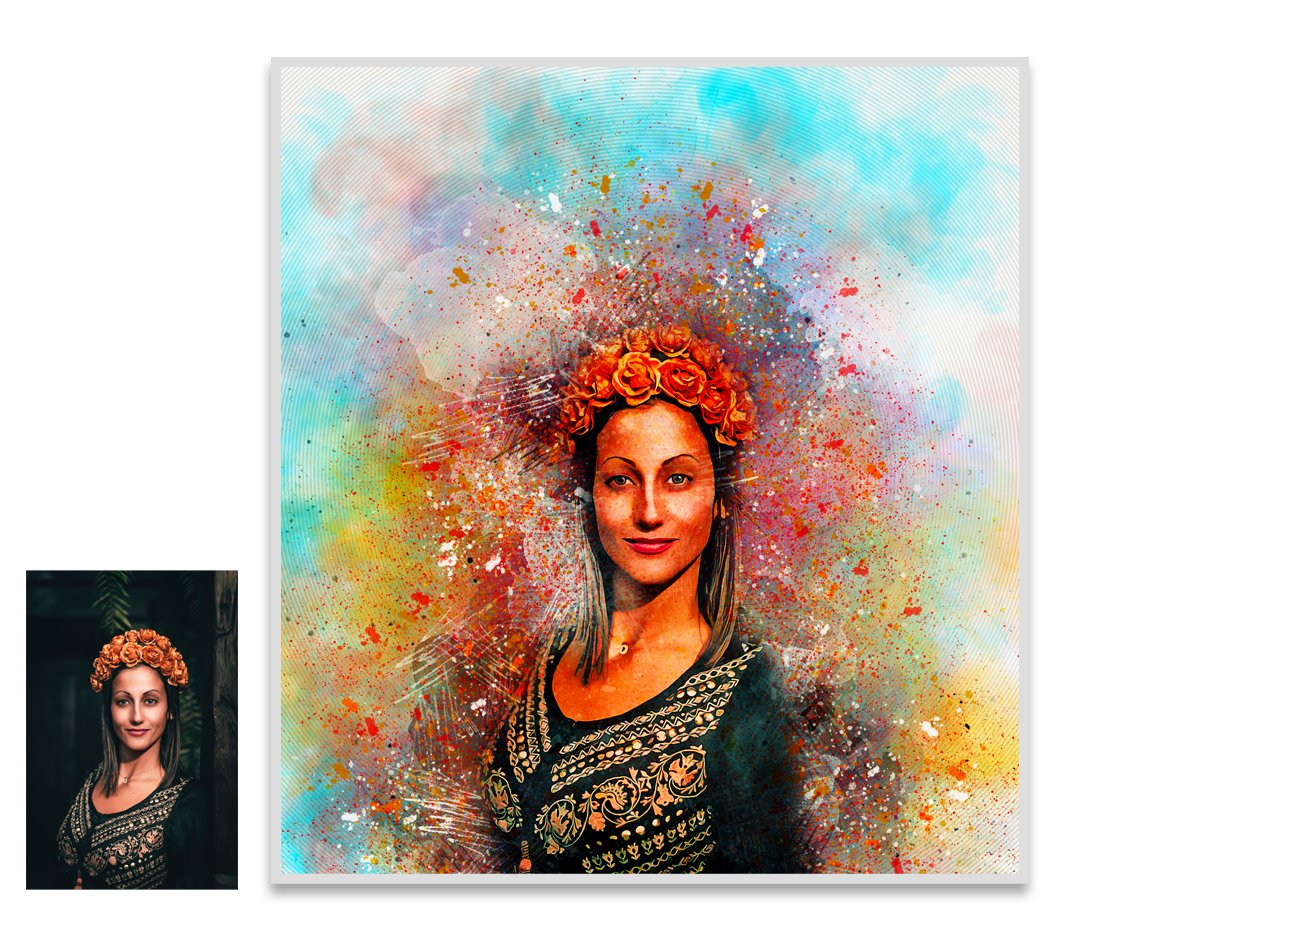 色彩分散碎片爆炸效果照片处理特效PS动作模板 Color Dispersion Photoshop Action插图2